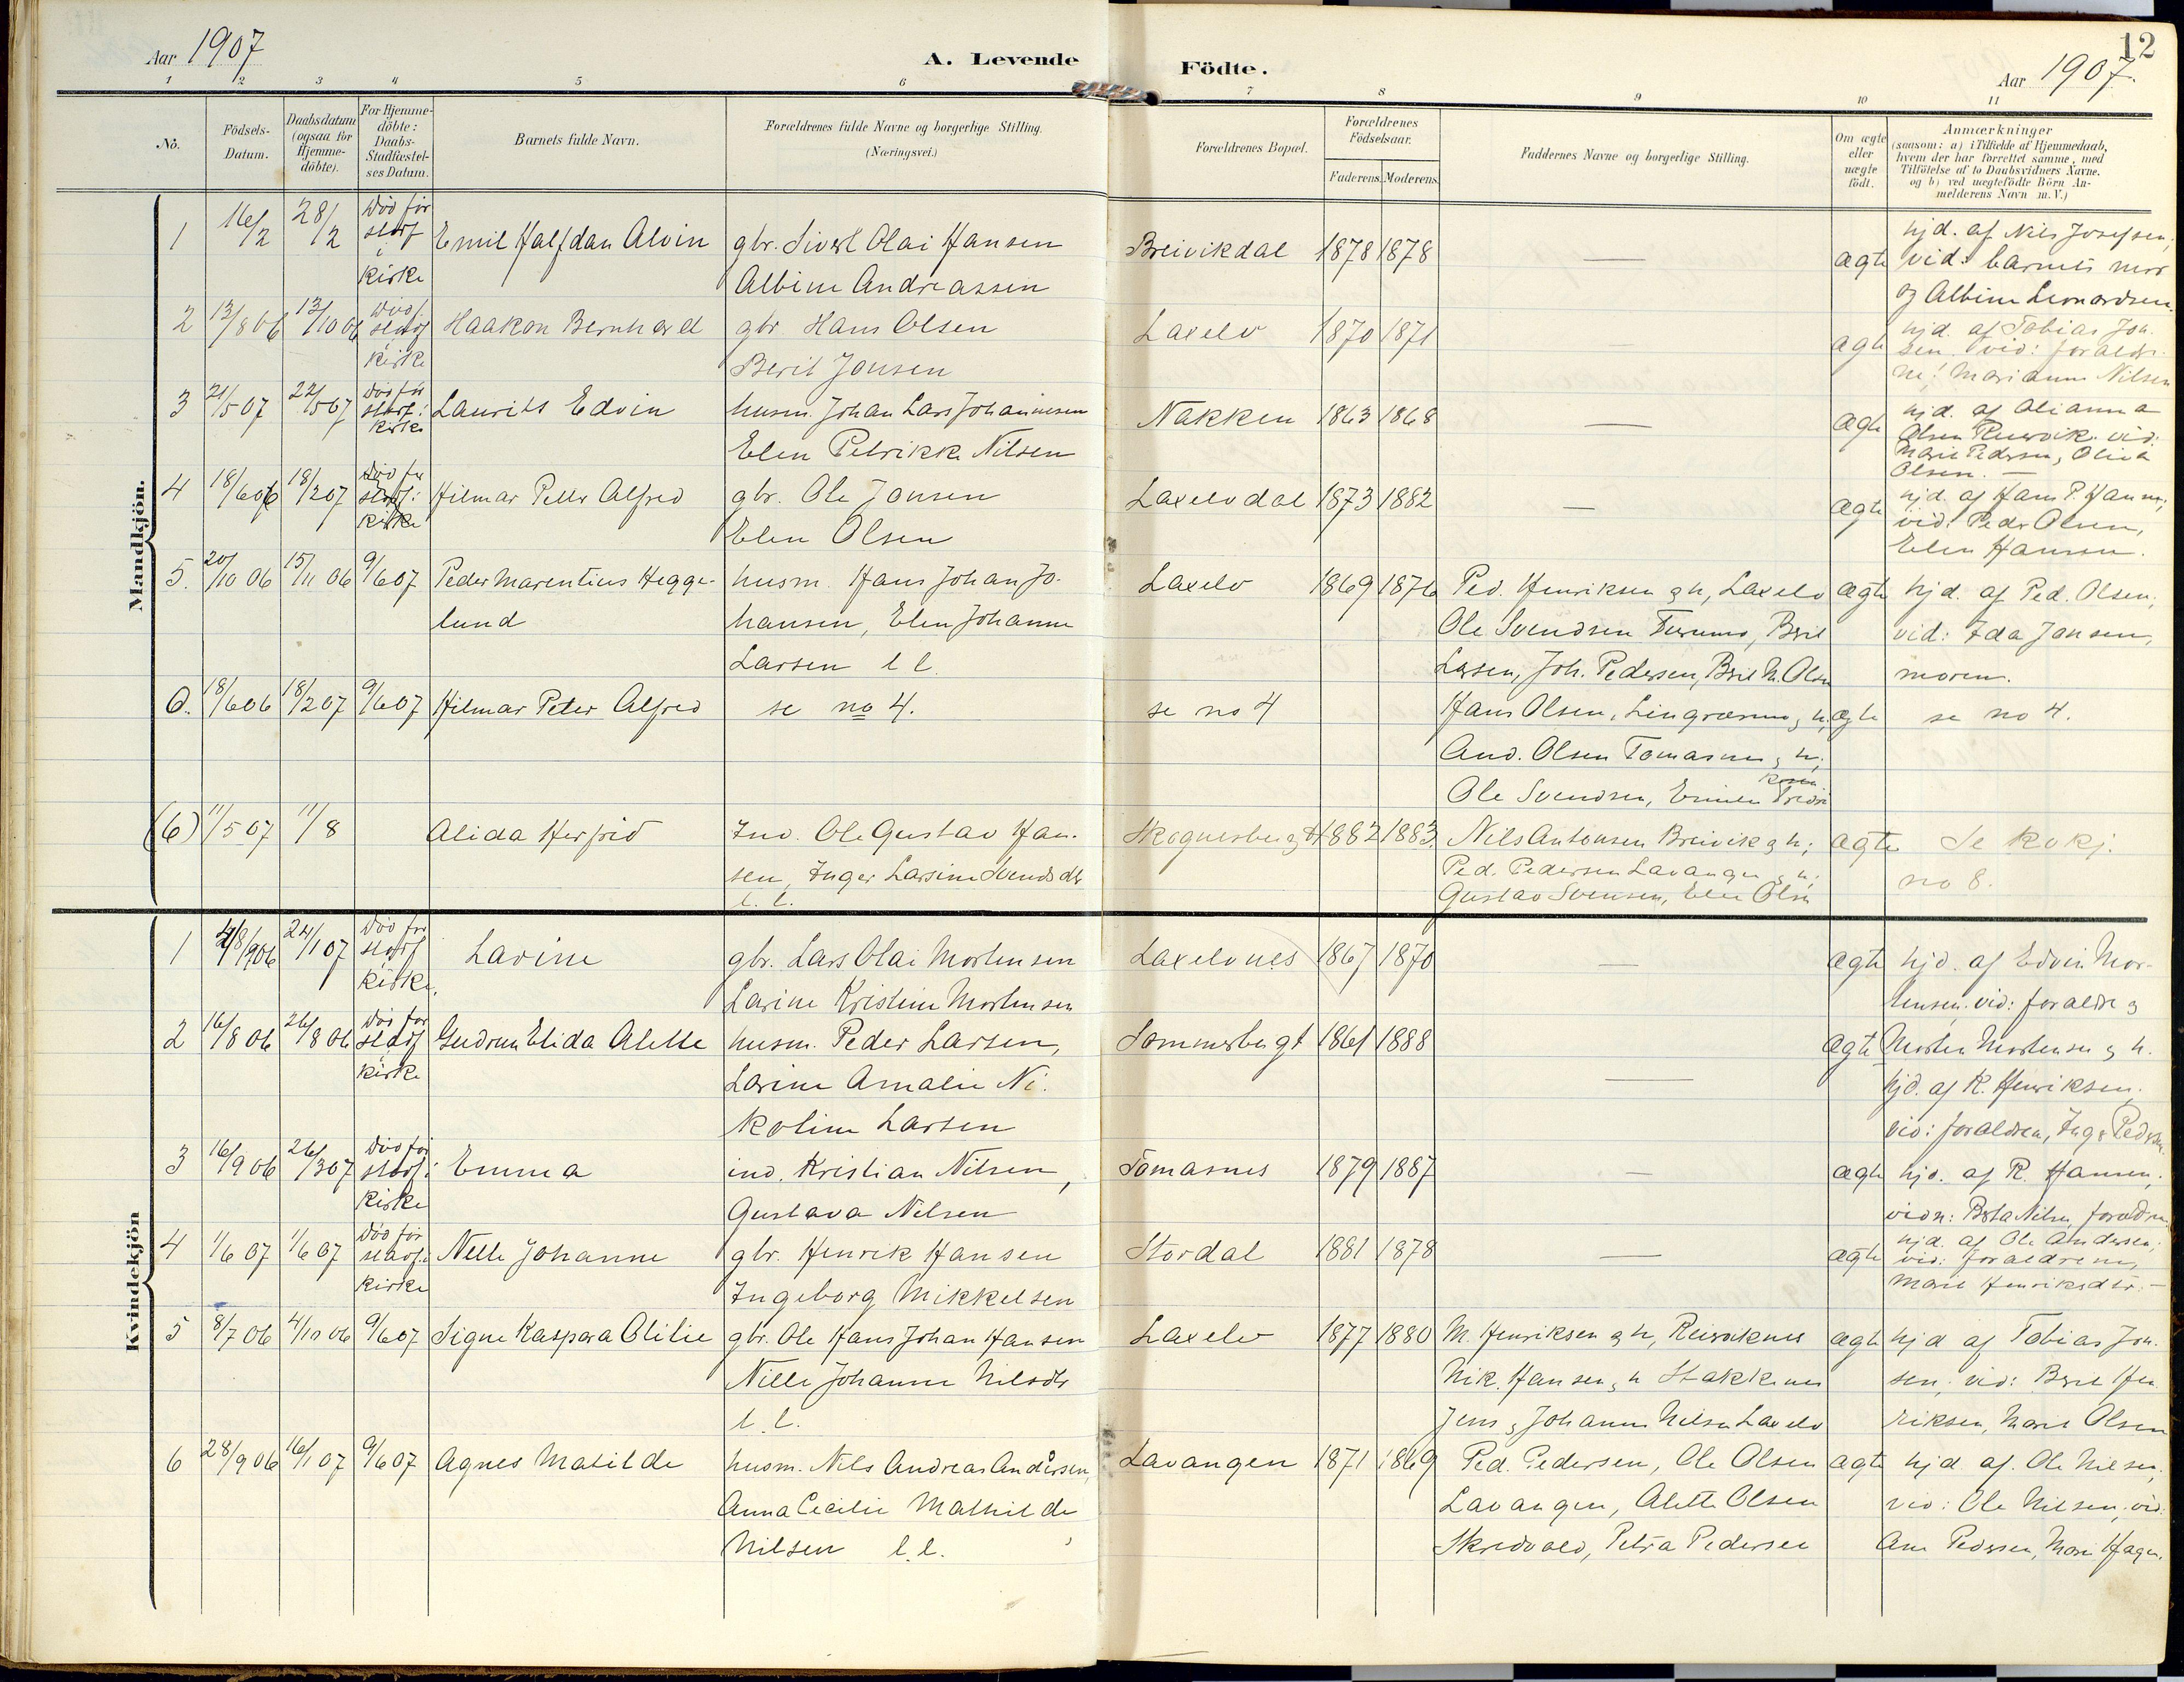 SATØ, Lyngen sokneprestembete, Ministerialbok nr. 14, 1905-1920, s. 12